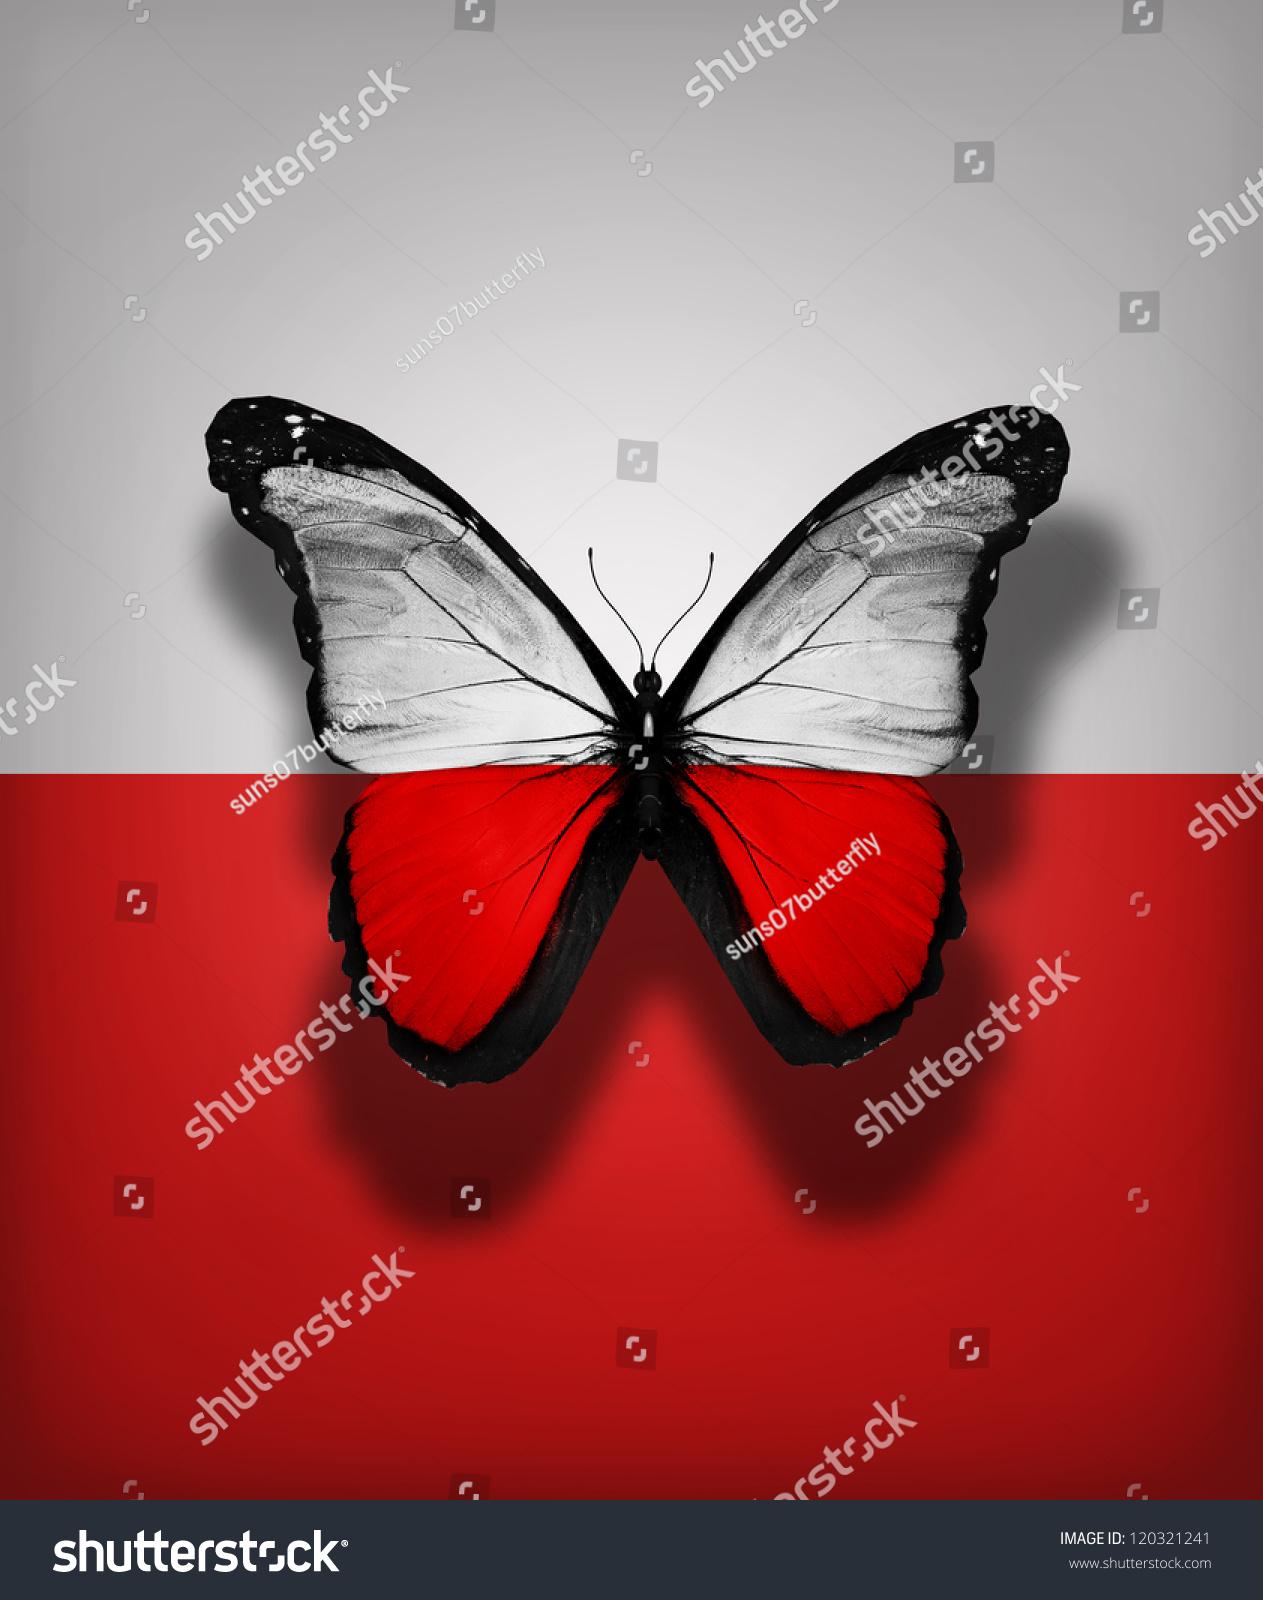 polish flag butterfly isolated on flag stock illustration